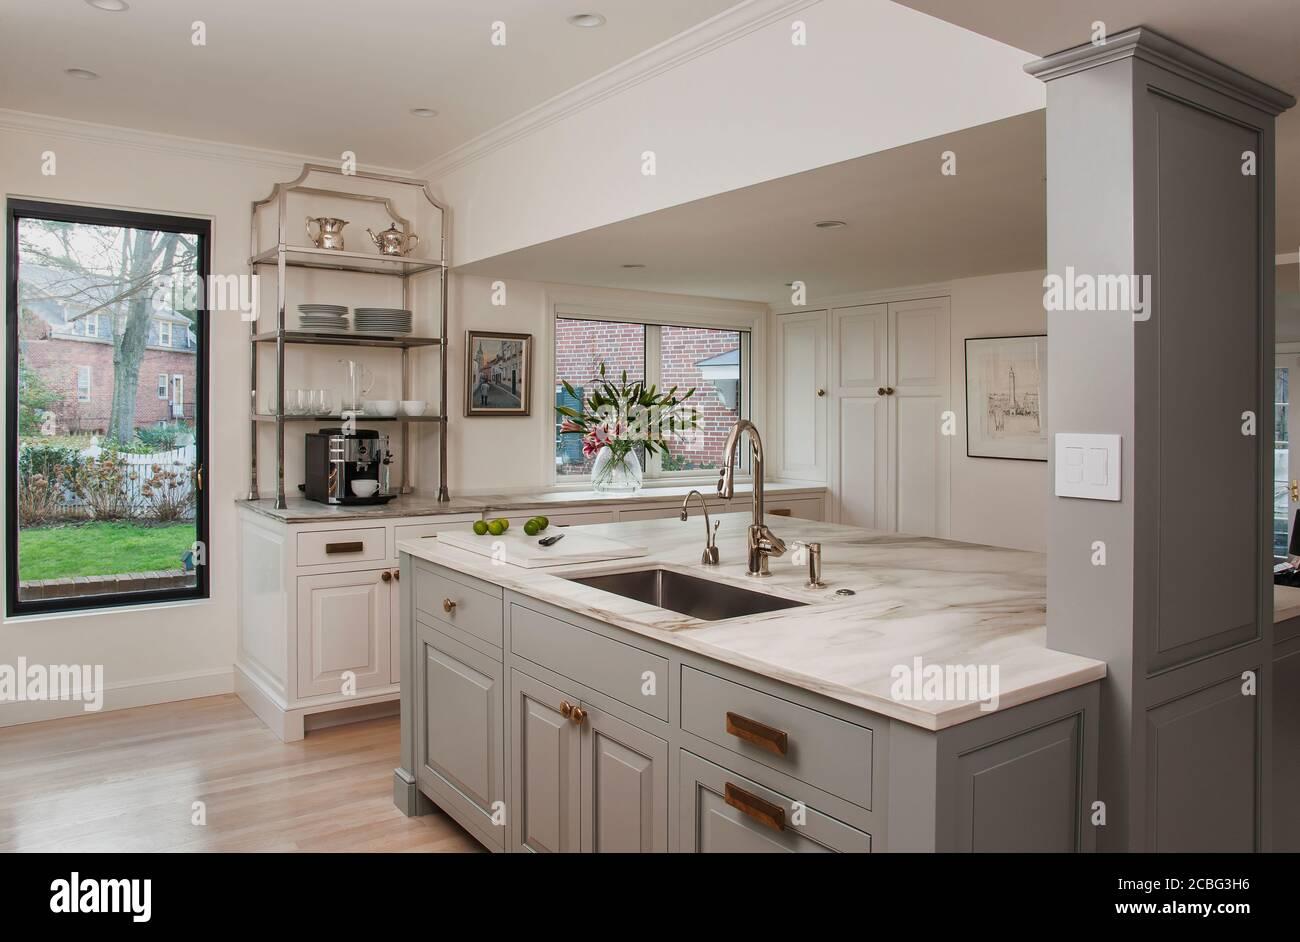 Gray And White Kitchen With Marble Backsplash Stock Photo Alamy